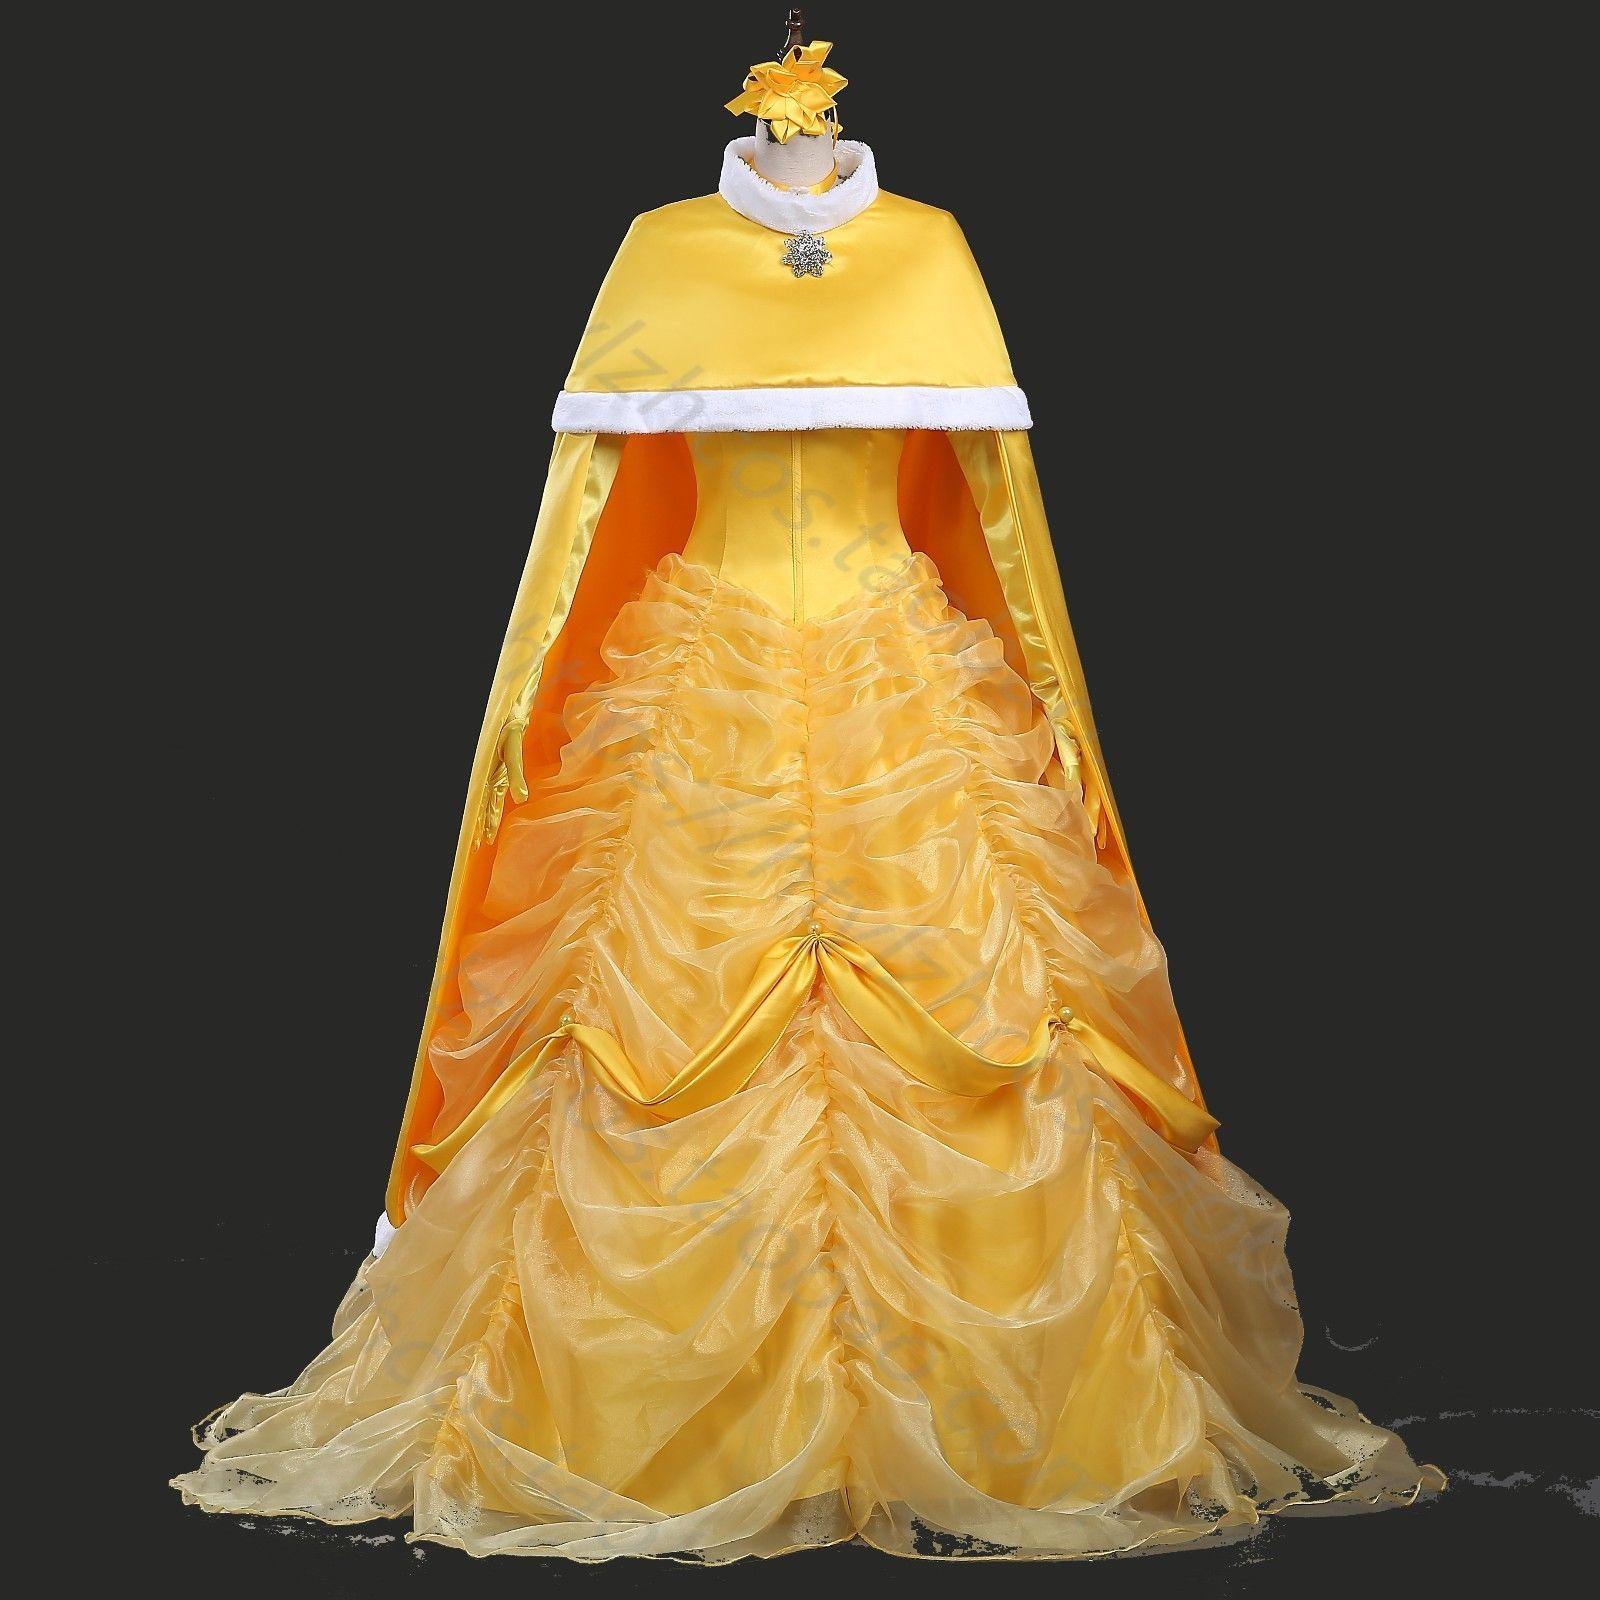 Yellow dress like belle  Women Princess Belle Costume The Beauty and The Beast Fancy Dress